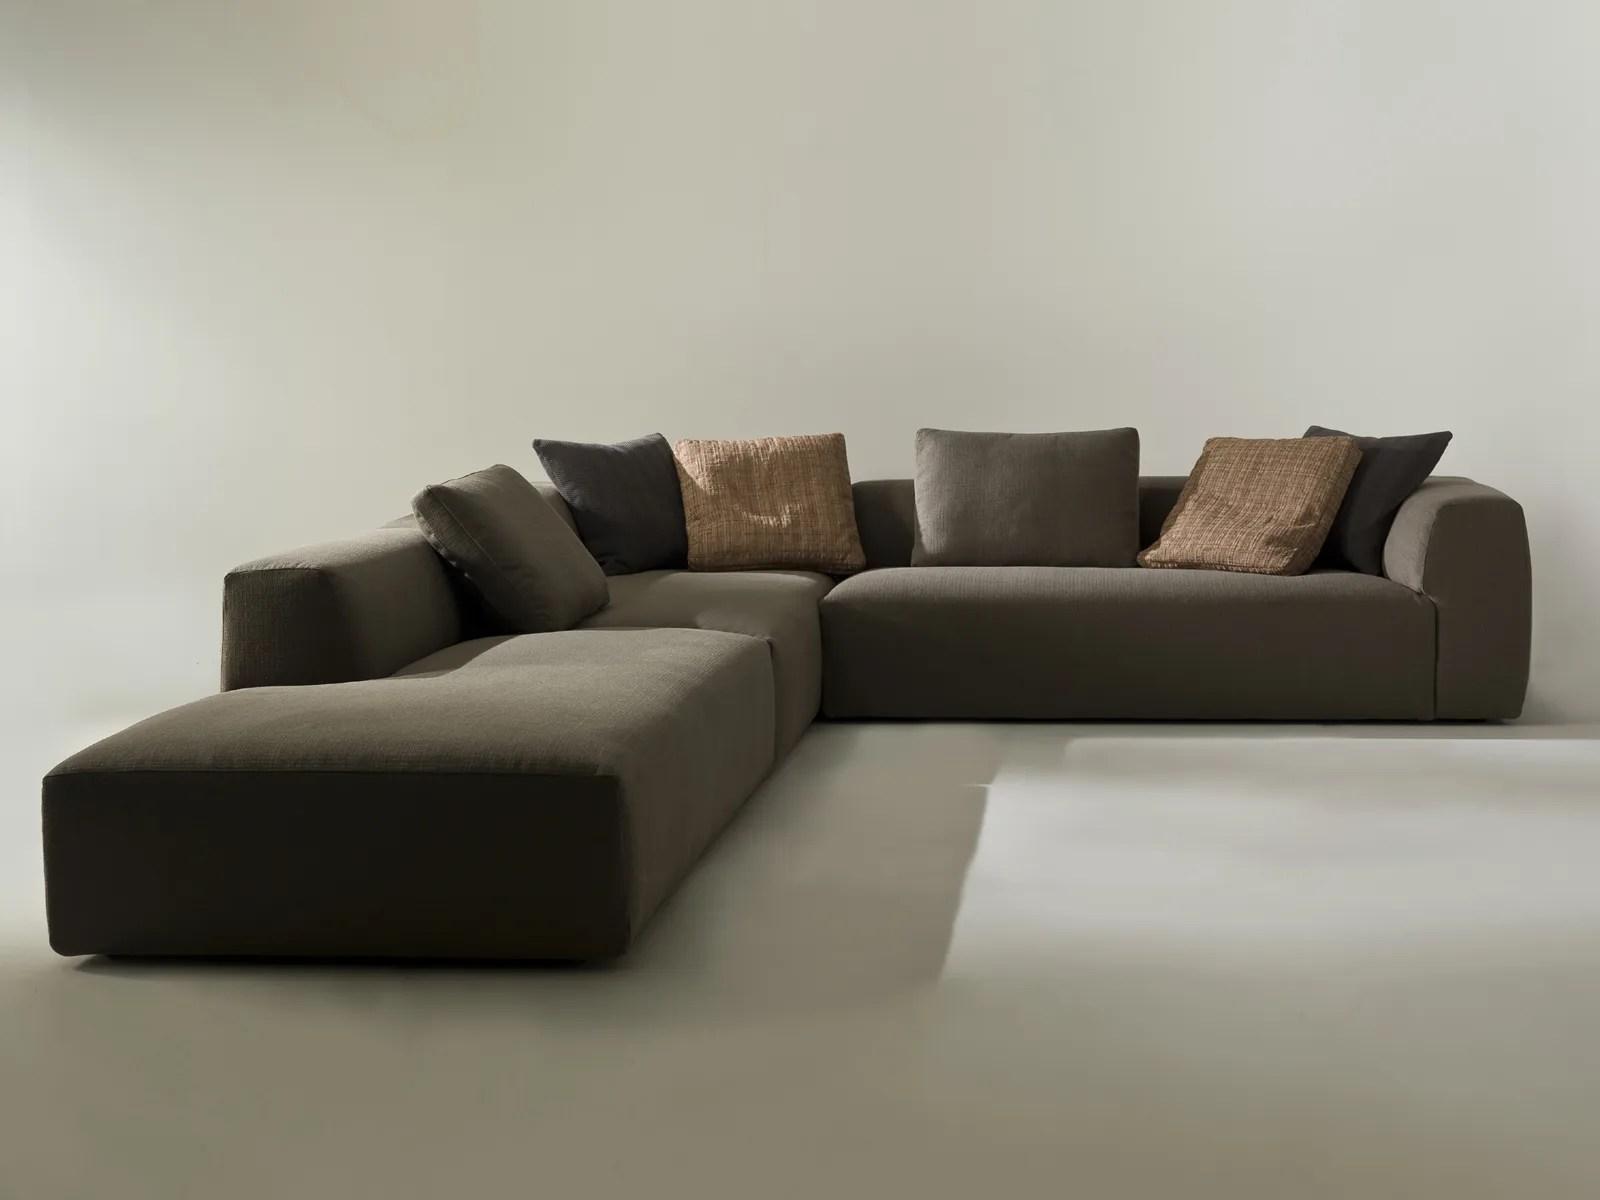 corner sofa plans high seating sofas klub by i 4 mariani design mauro lipparini